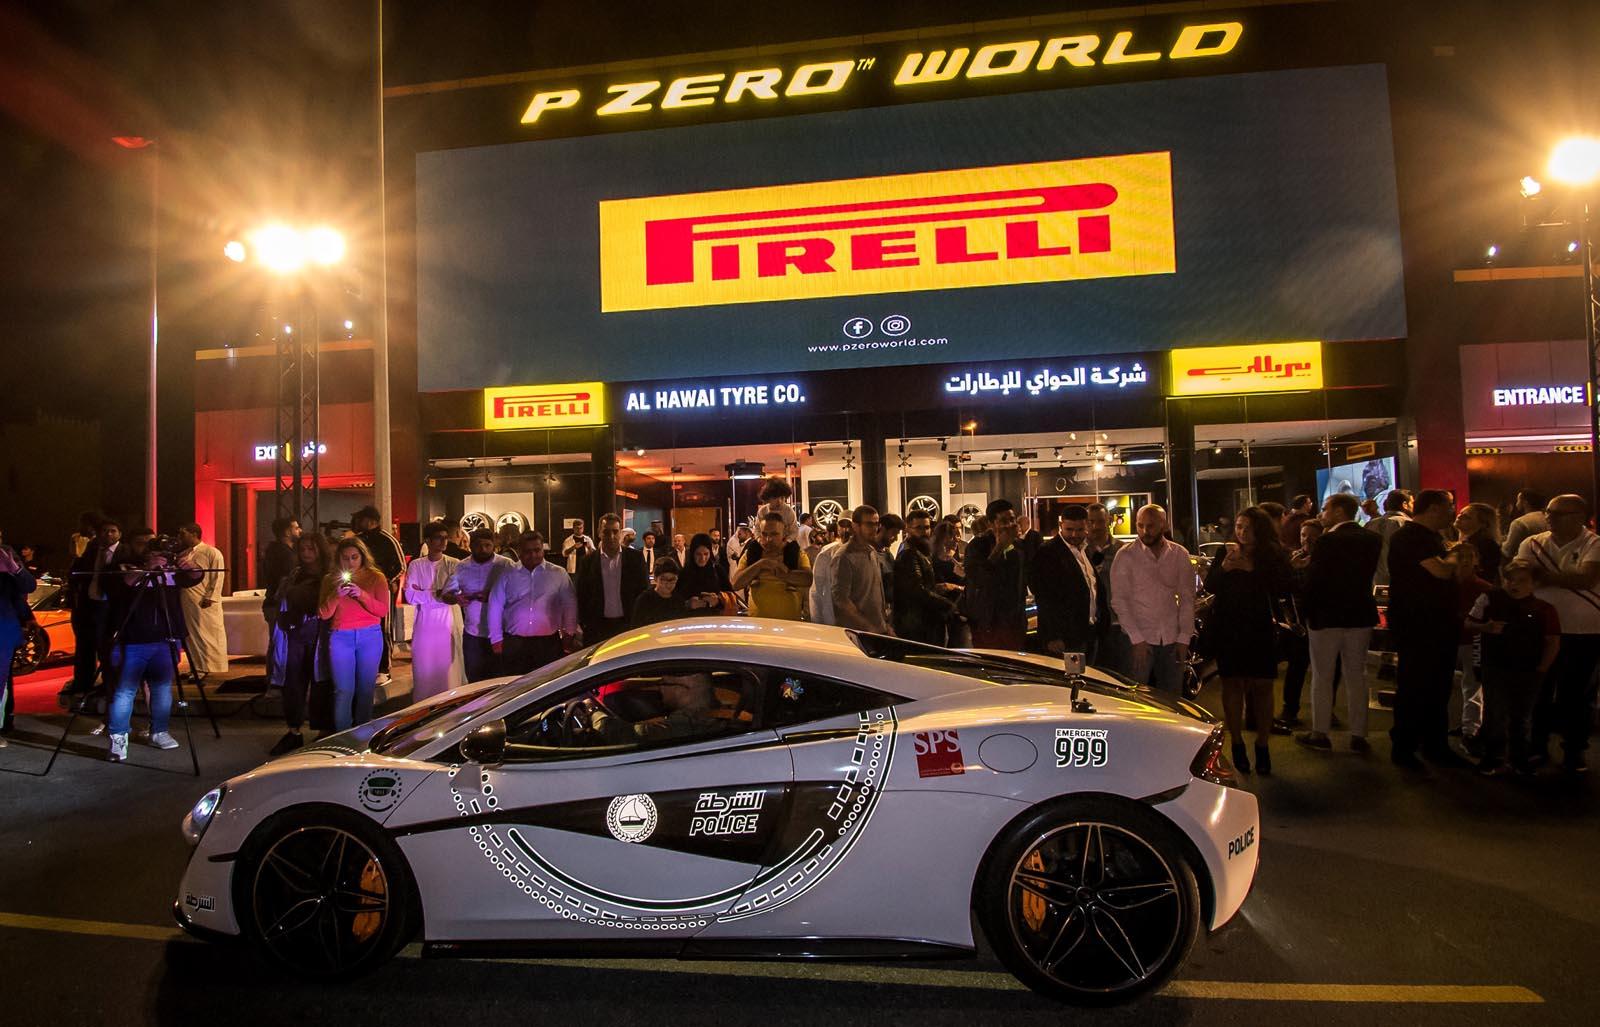 Photo of Pirelli: Νέο κατάστημα P Zero World στο Ντουμπάι